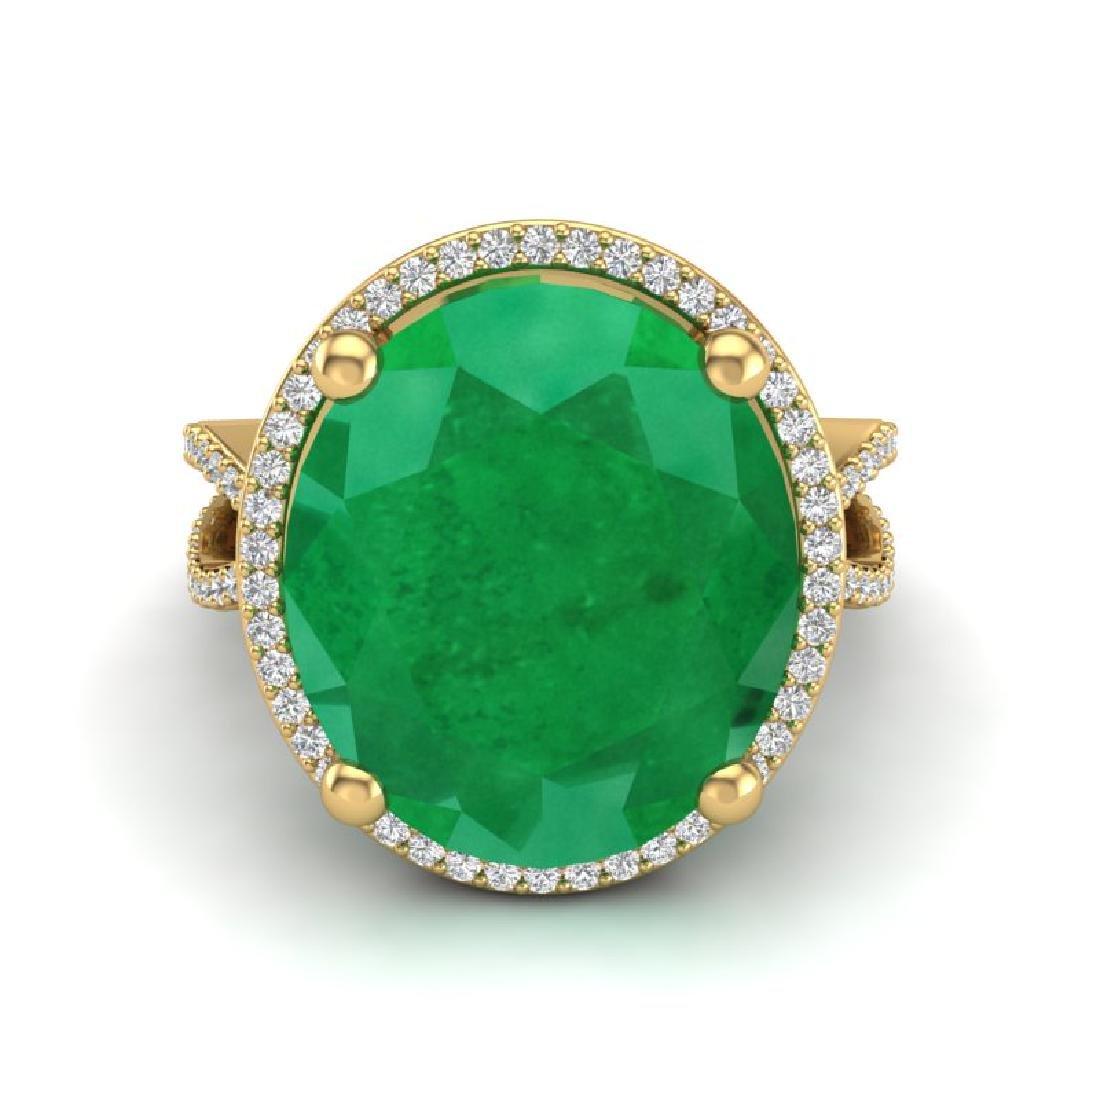 12 CTW Emerald & Micro Pave VS/SI Diamond Halo Ring 18K